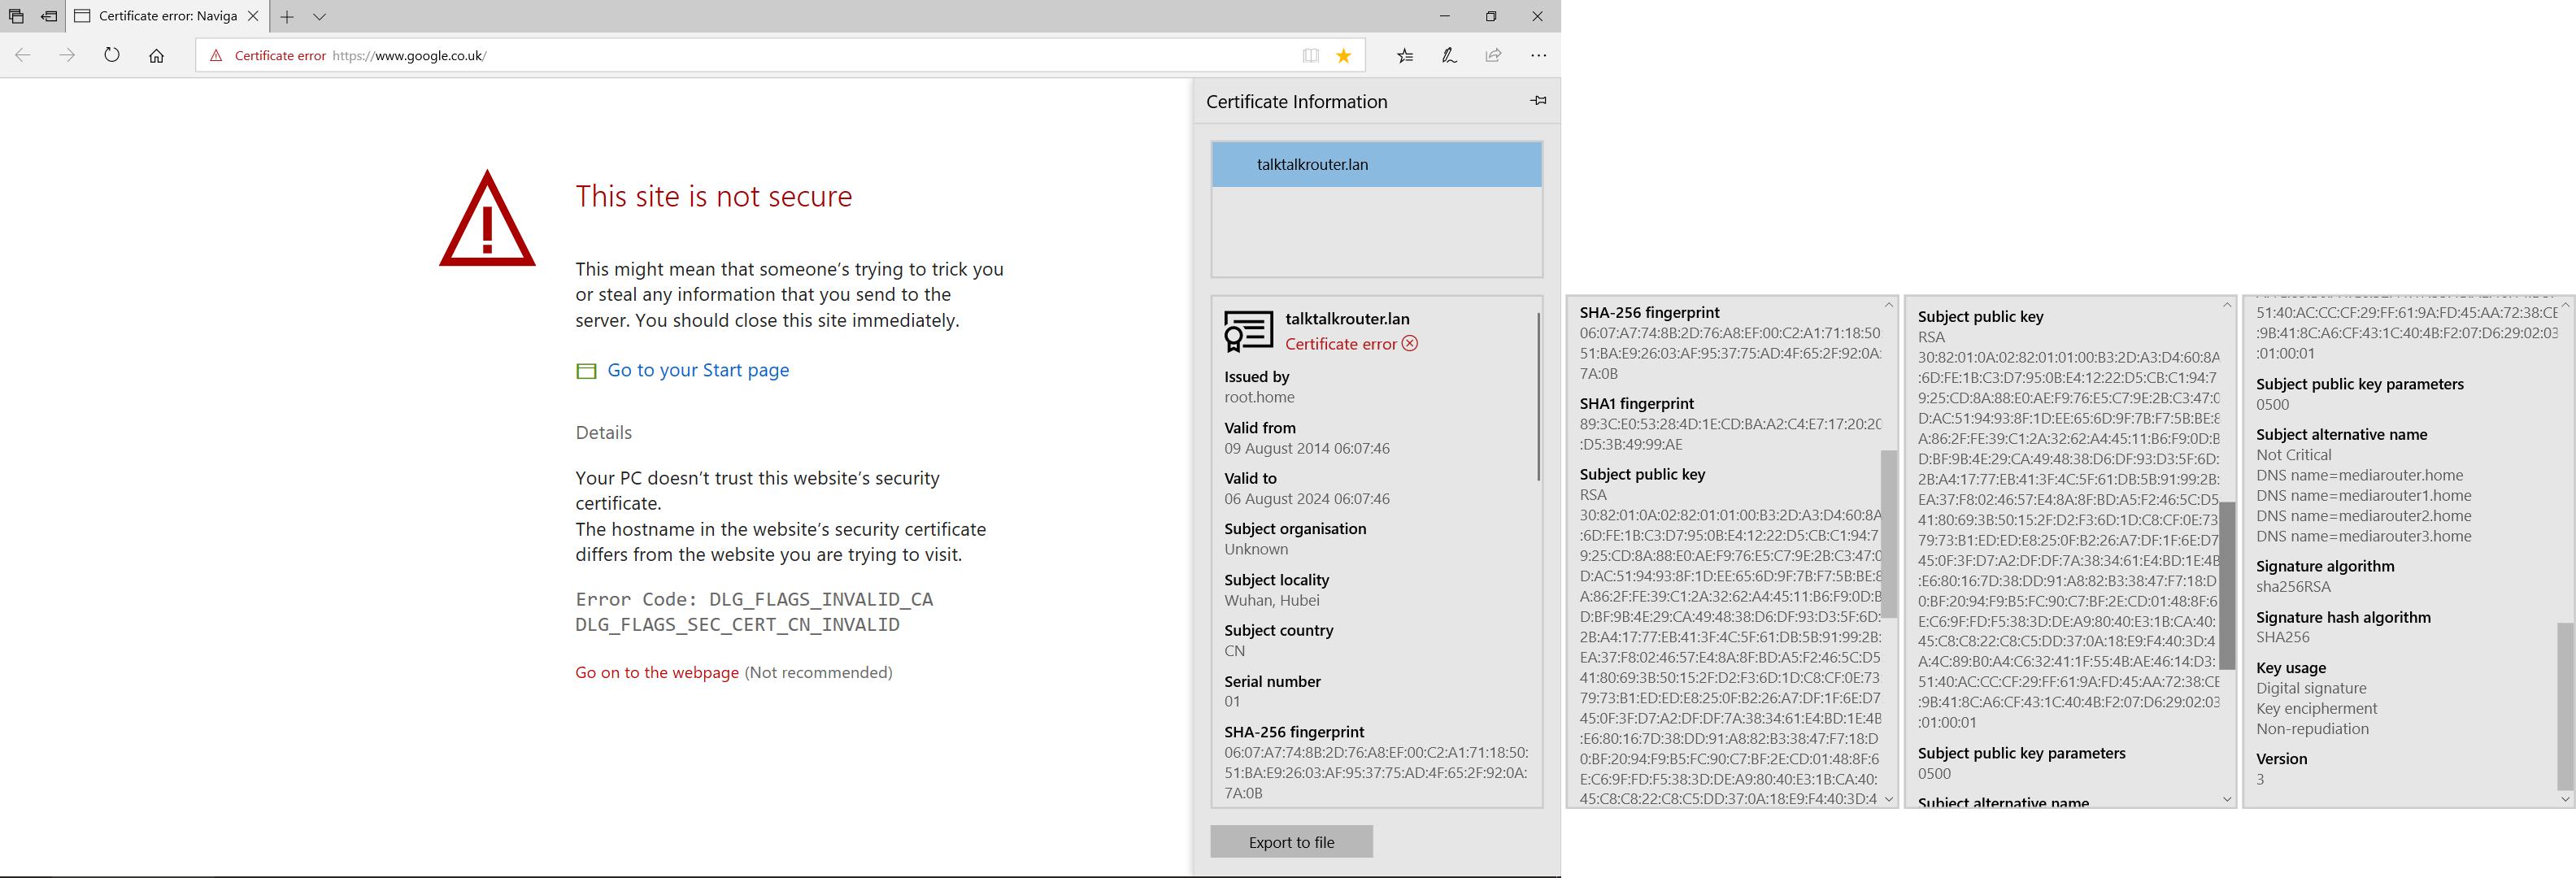 This Site Is Not Secure Talktalkroutern Certi Talktalk